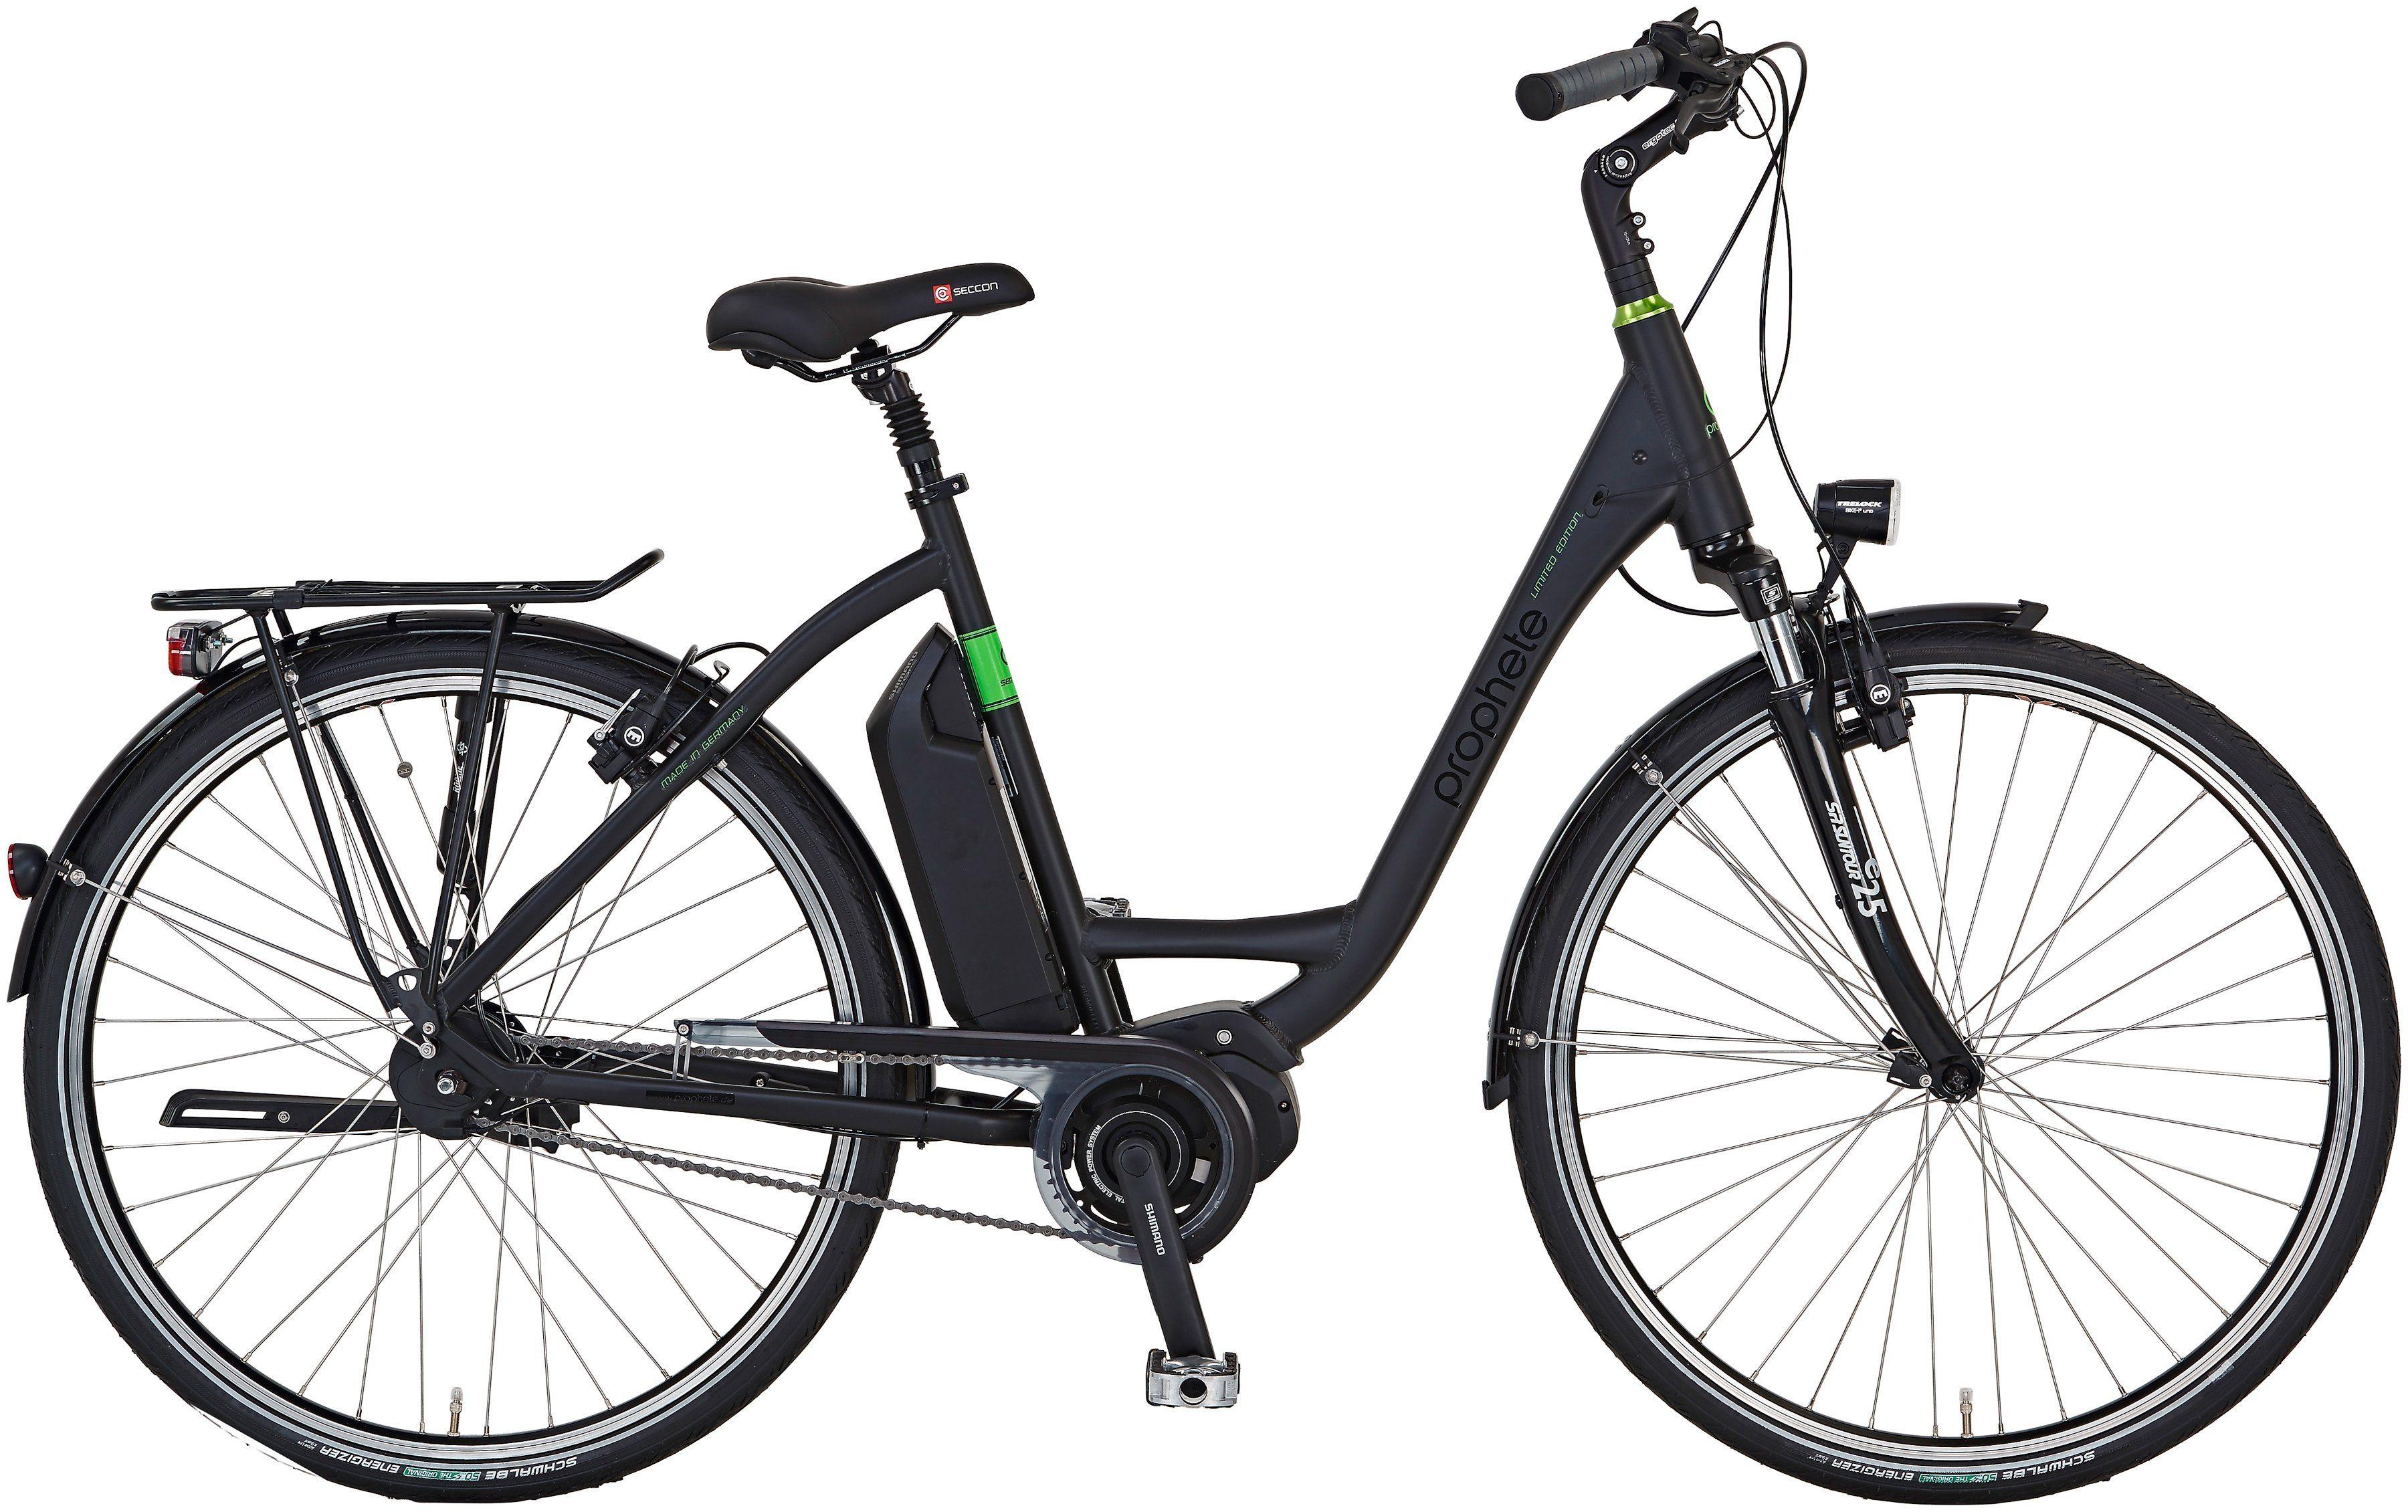 Prophete E-Bike City Damen »Limited Edition«, 28 Zoll, 8-Gang, Mittelmotor, 417 Wh, RH52